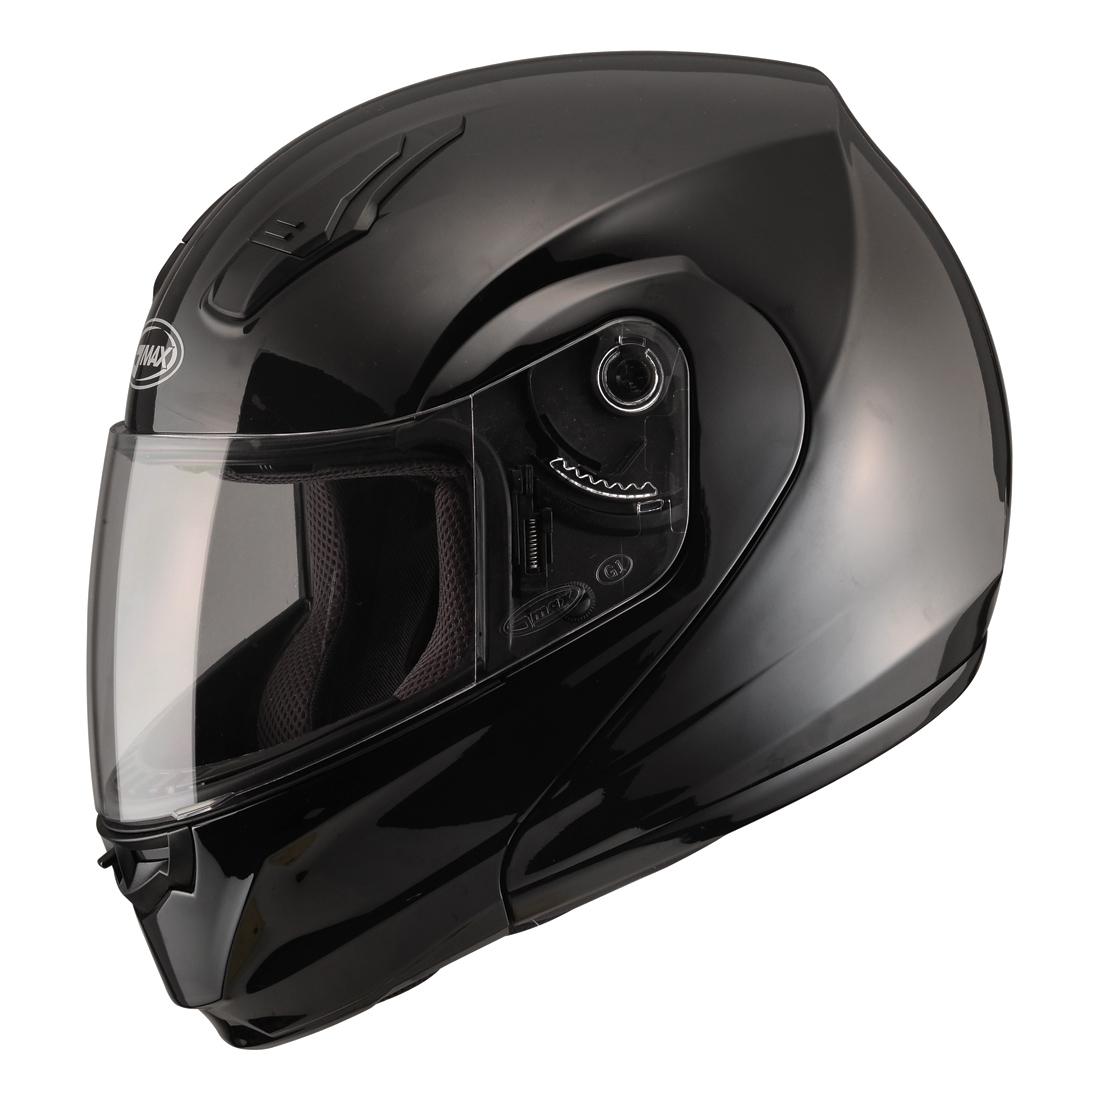 GMAX MD04 Gloss Black Modular Helmet